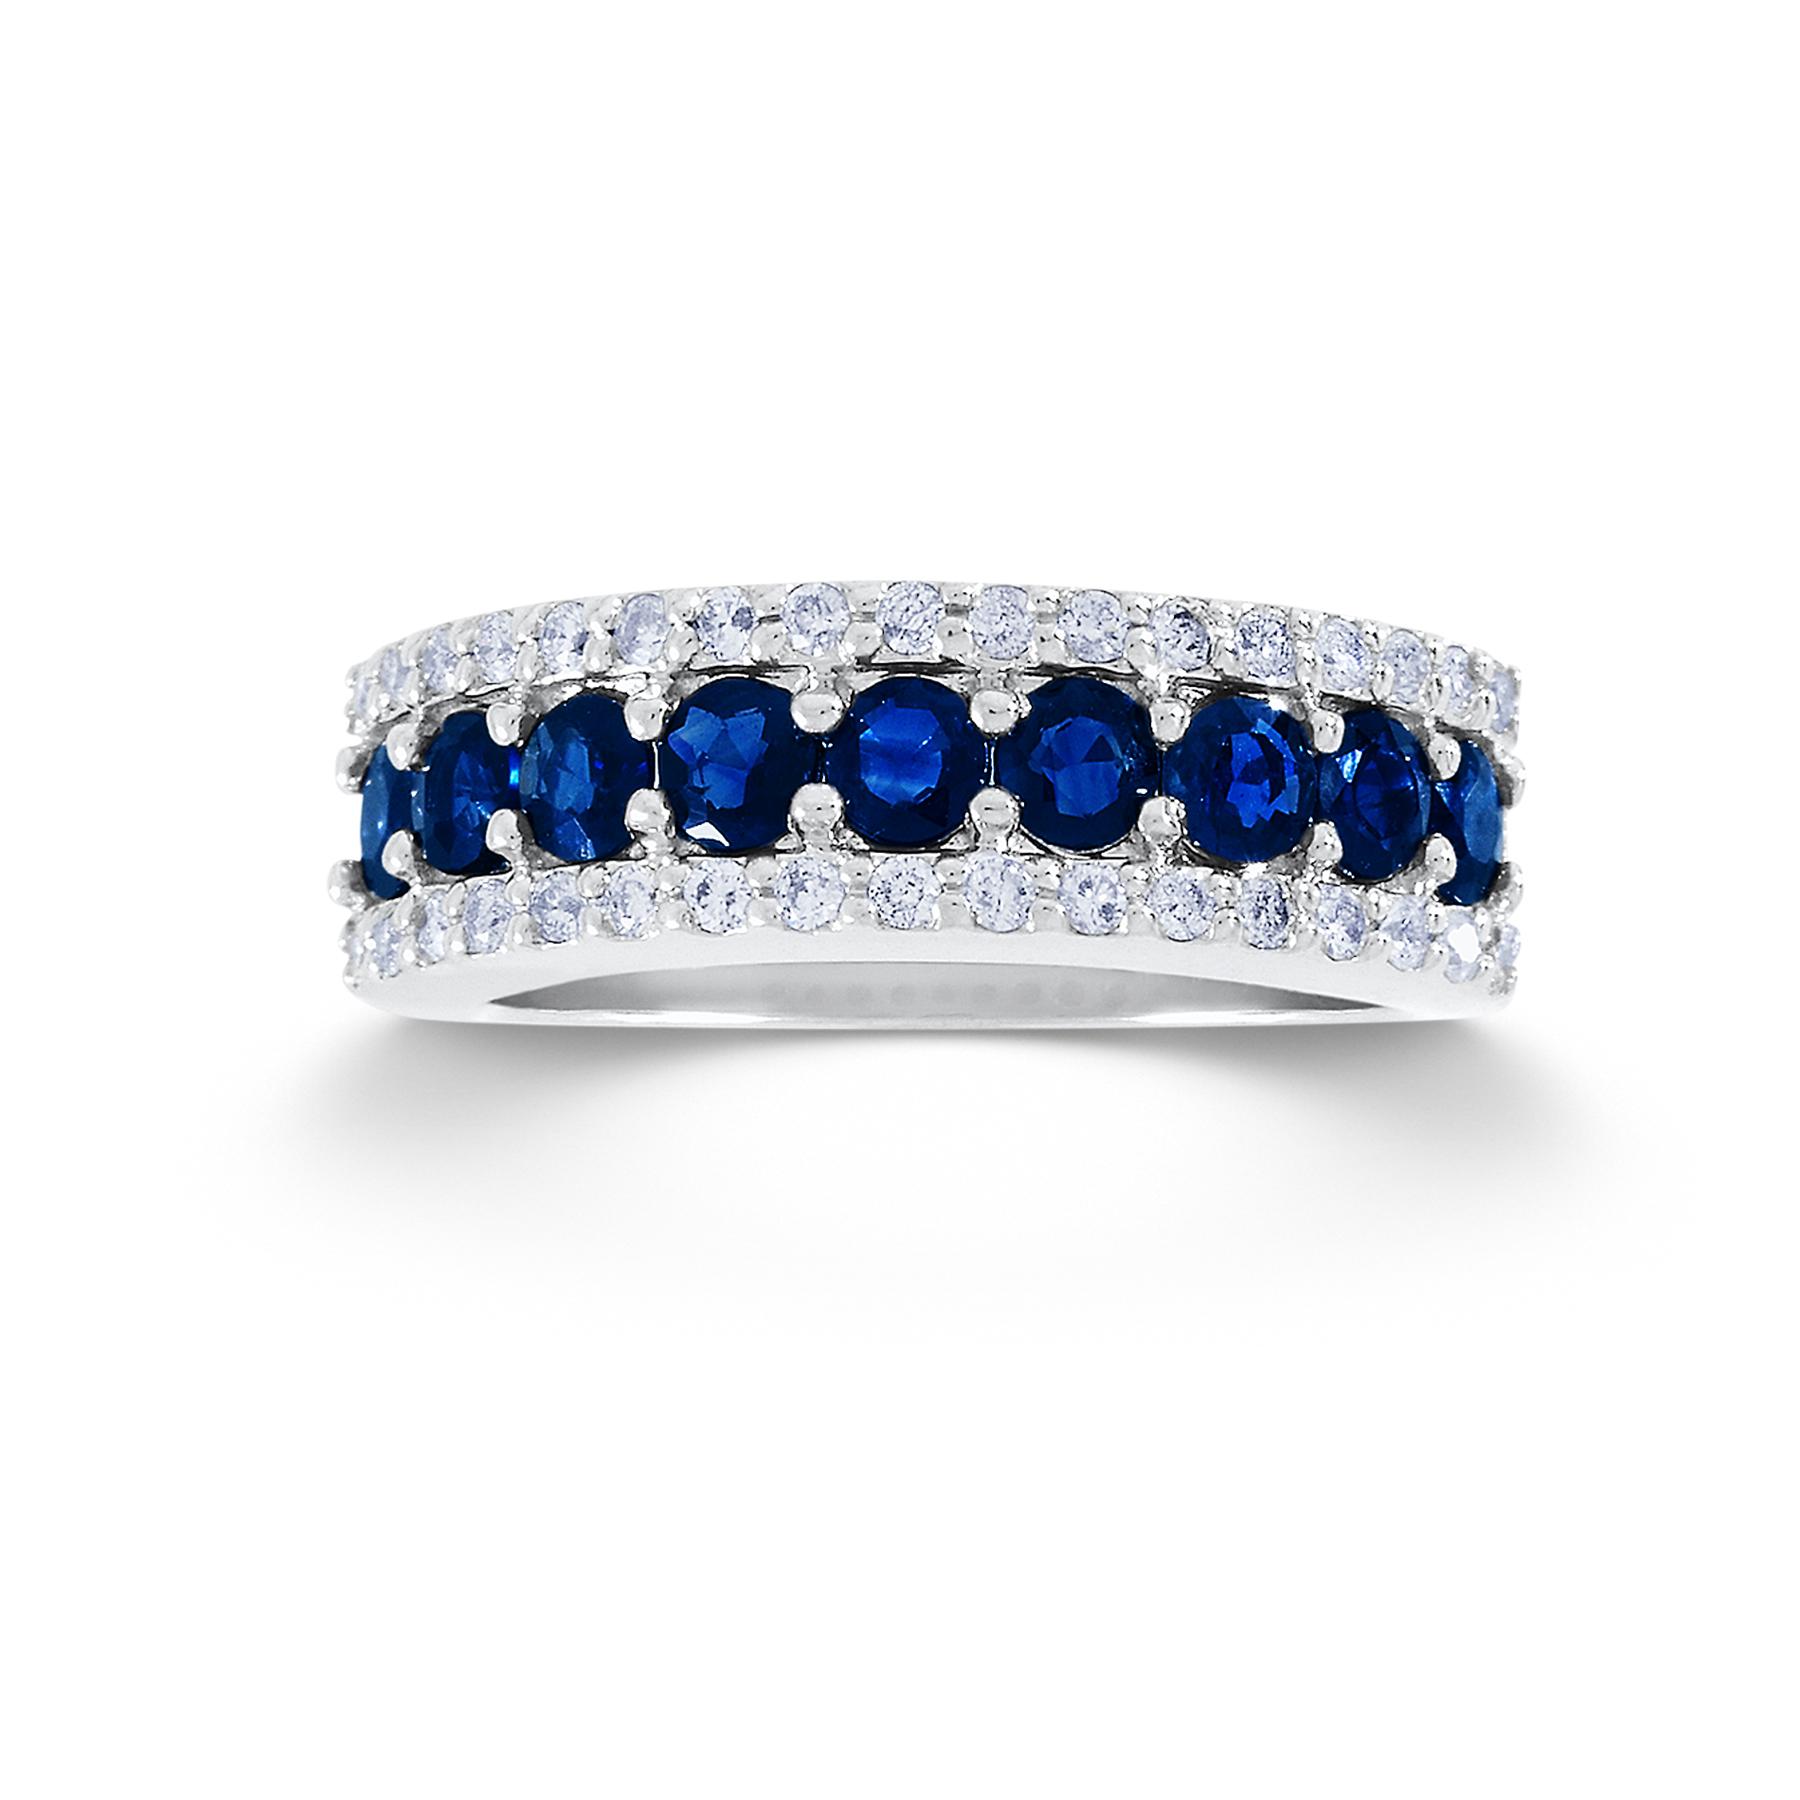 13 Cttw Round 10k White Gold Diamond Amp Sapphire Wedding